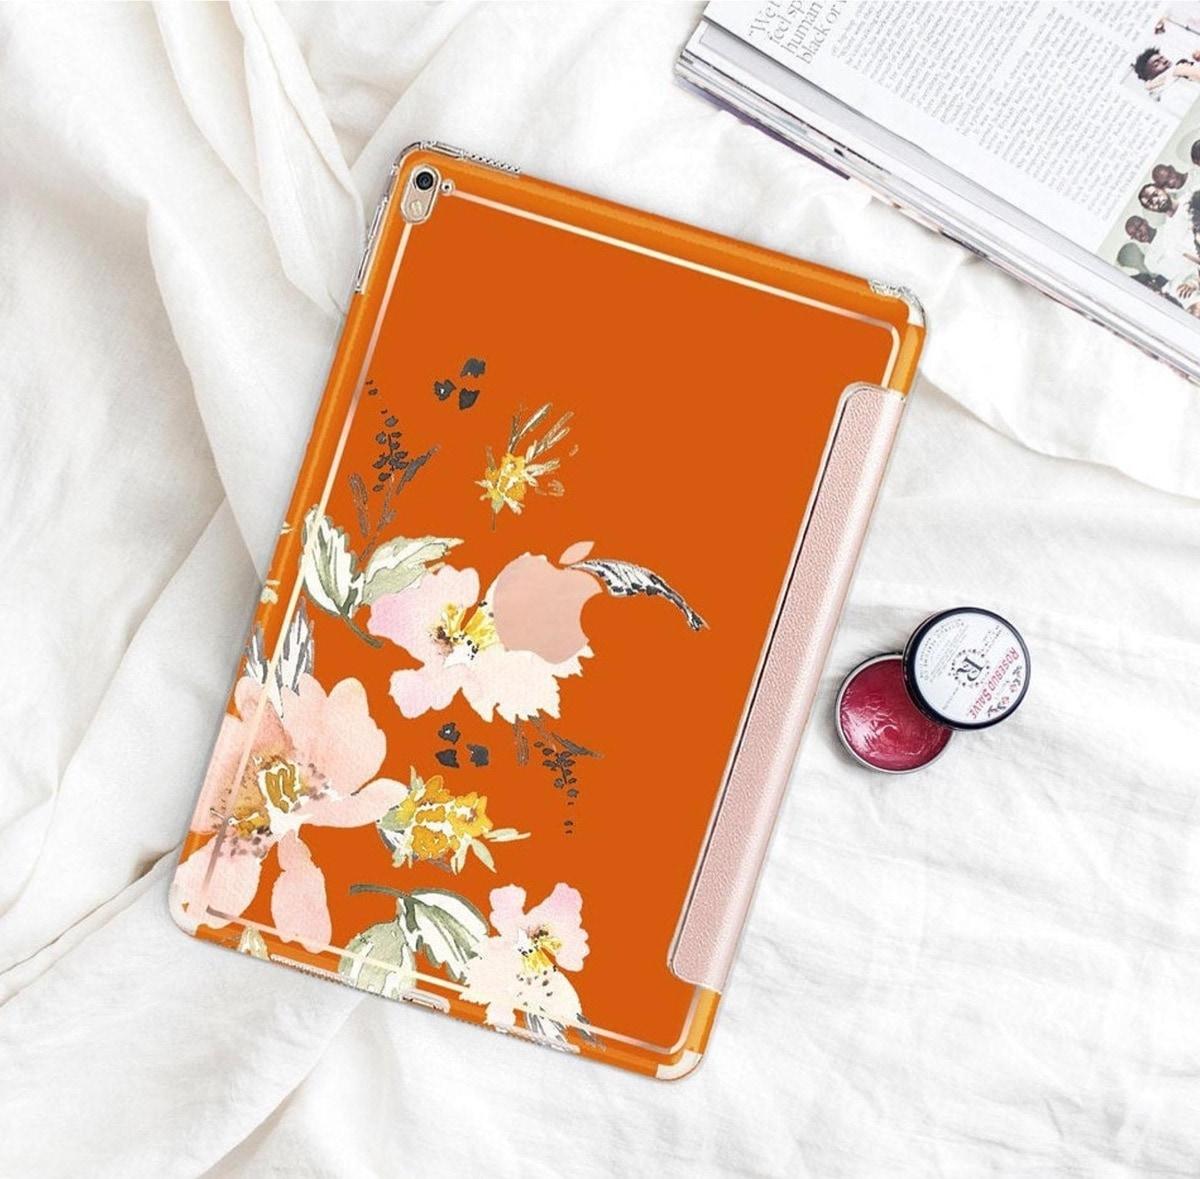 Fashionable tri-fold case iPad Pro 11 compatible